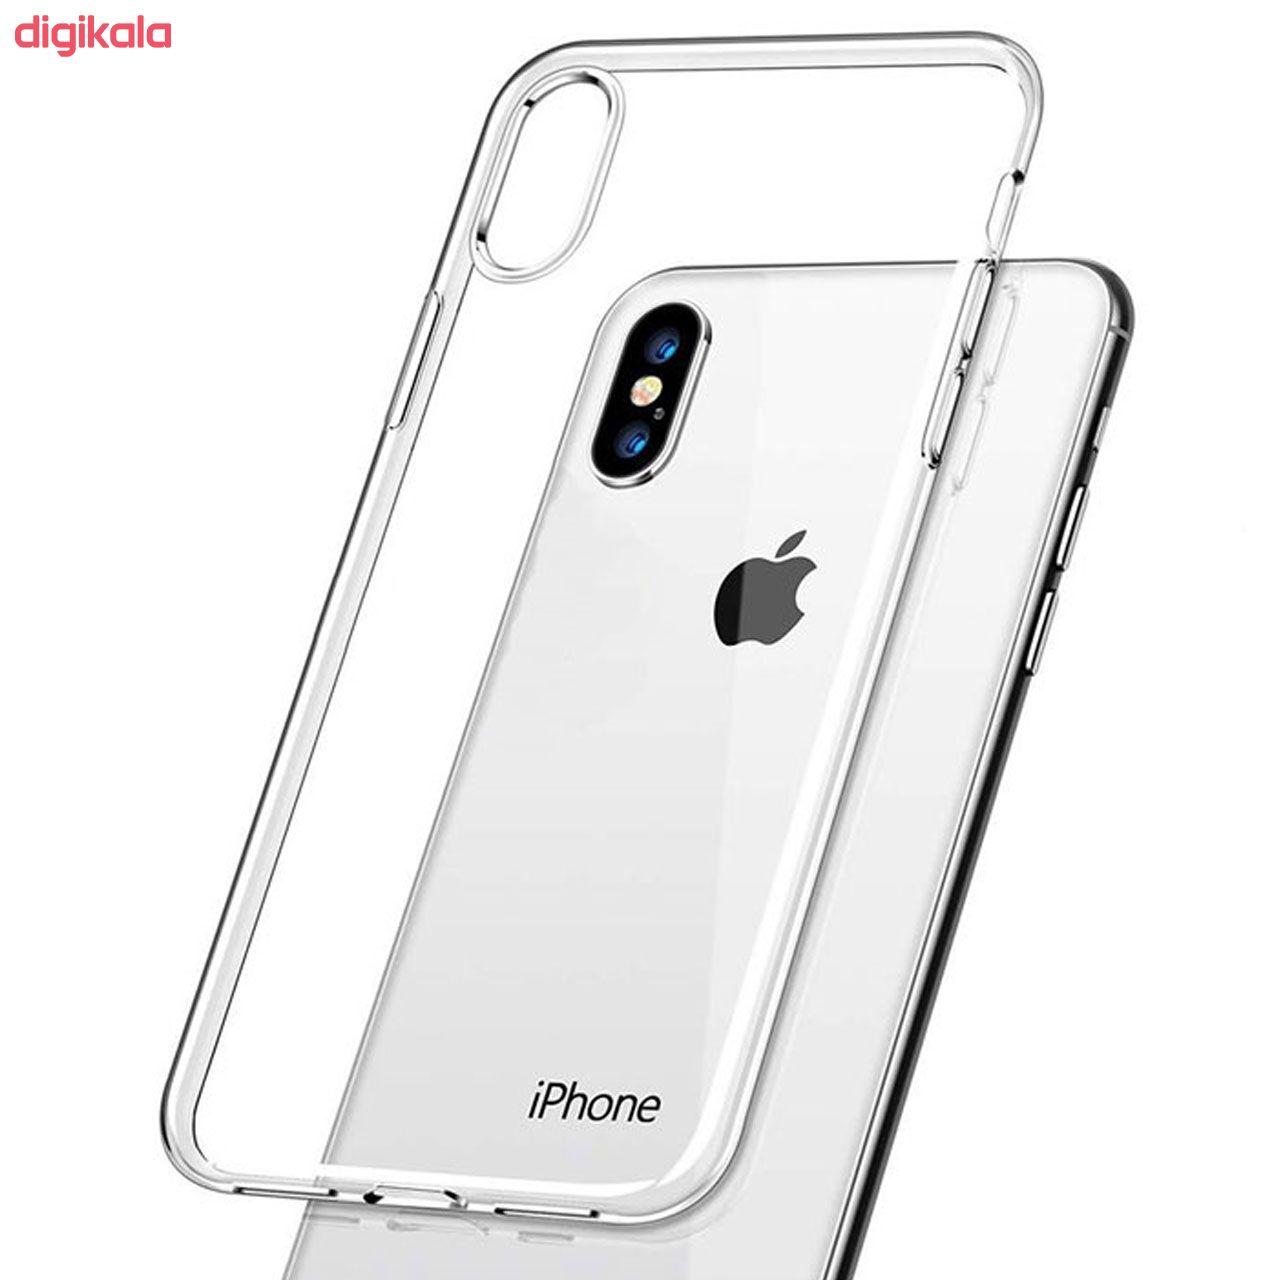 کاور مدل BLKN مناسب برای گوشی موبایل اپل iPhone XS Max main 1 11